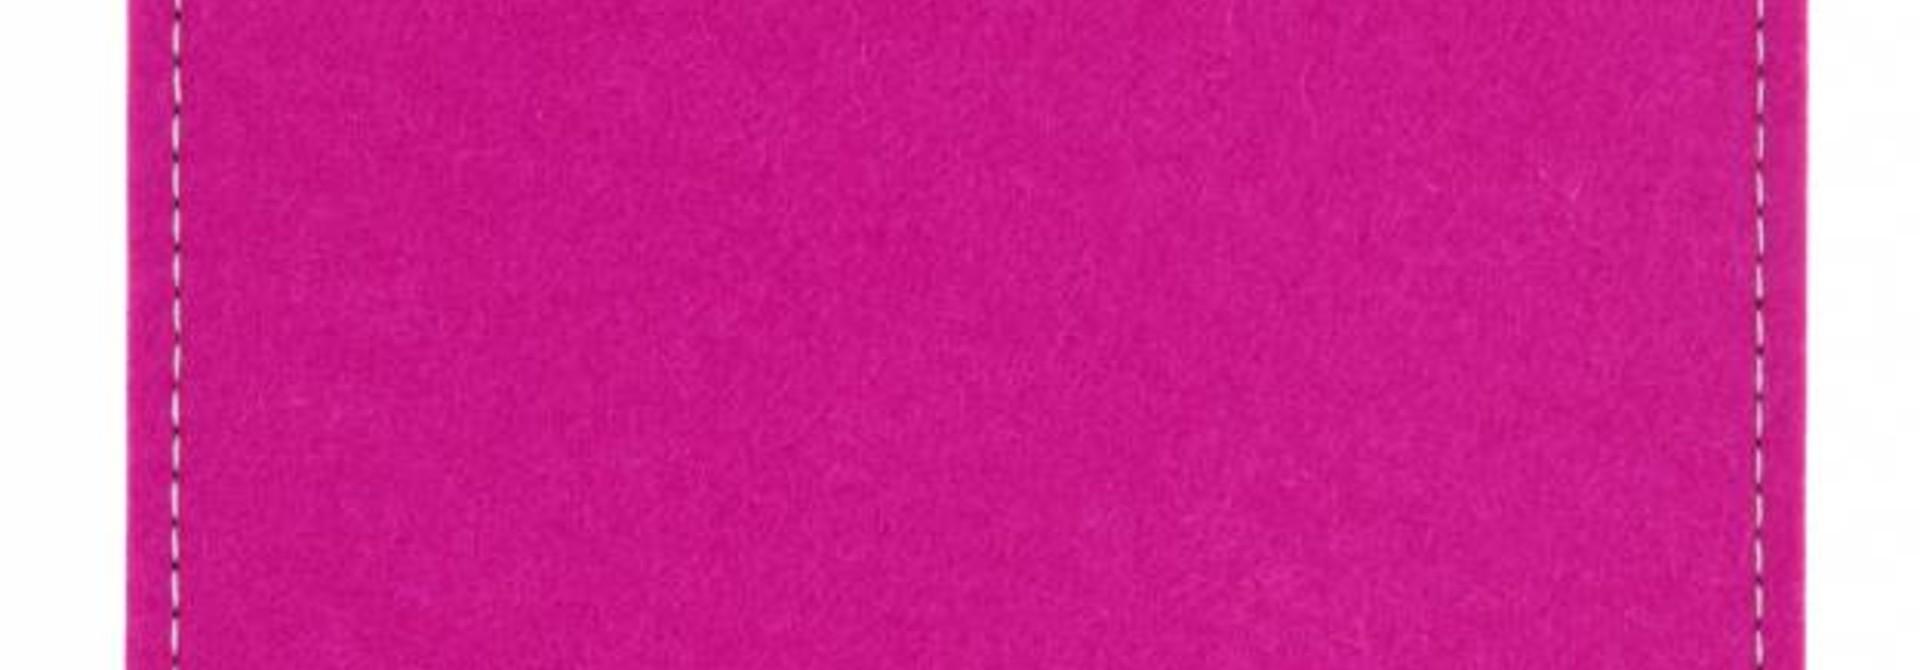 Tab Sleeve Pink